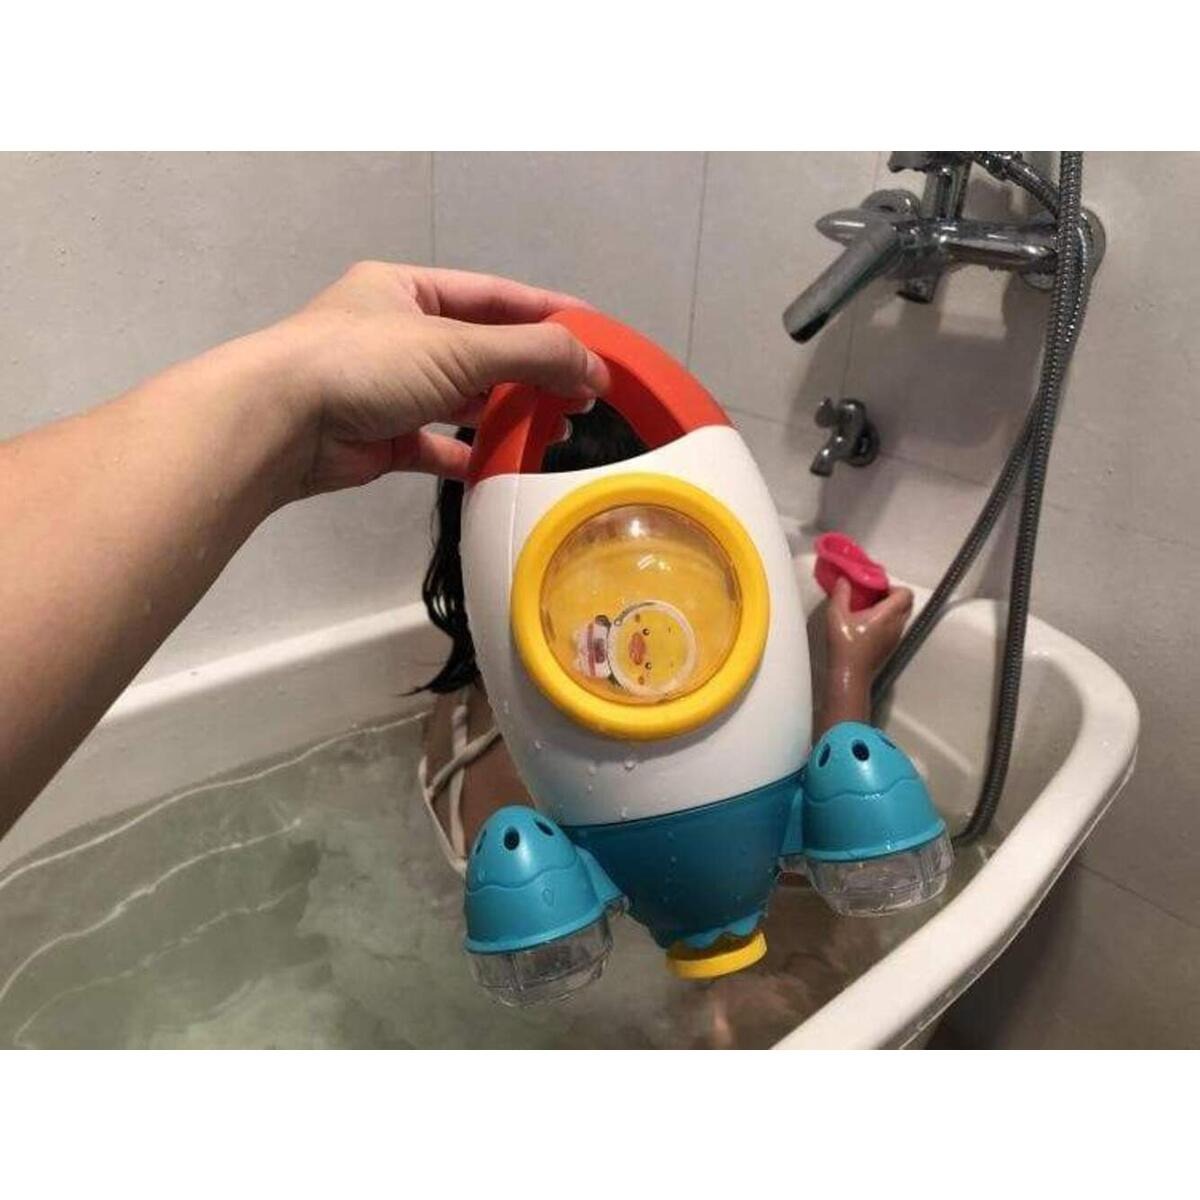 Baby Bath Toy, Rotating Rocket Water Spray shower Bath Toys, Shower Shampoo Play Toys Gifts